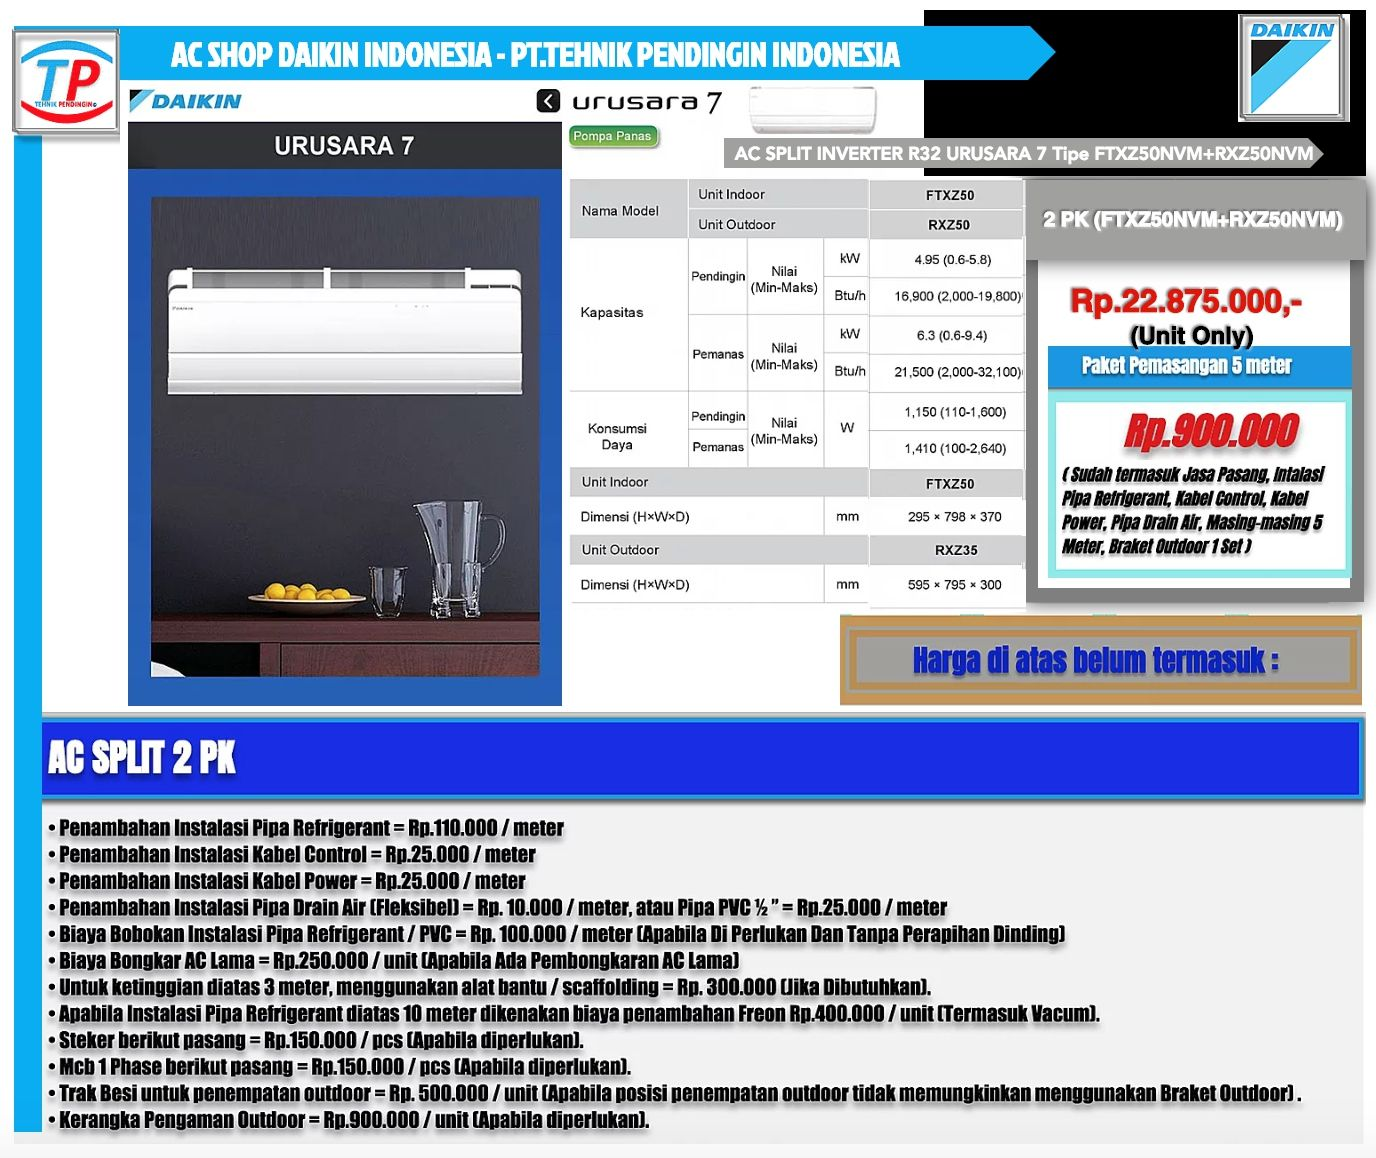 Jual Ac Daikin 1 Pk R32 Welcome To Standard Rv Ftv25axv14 Indoor Outdoor Only Split Inverter 2 Urusara 7